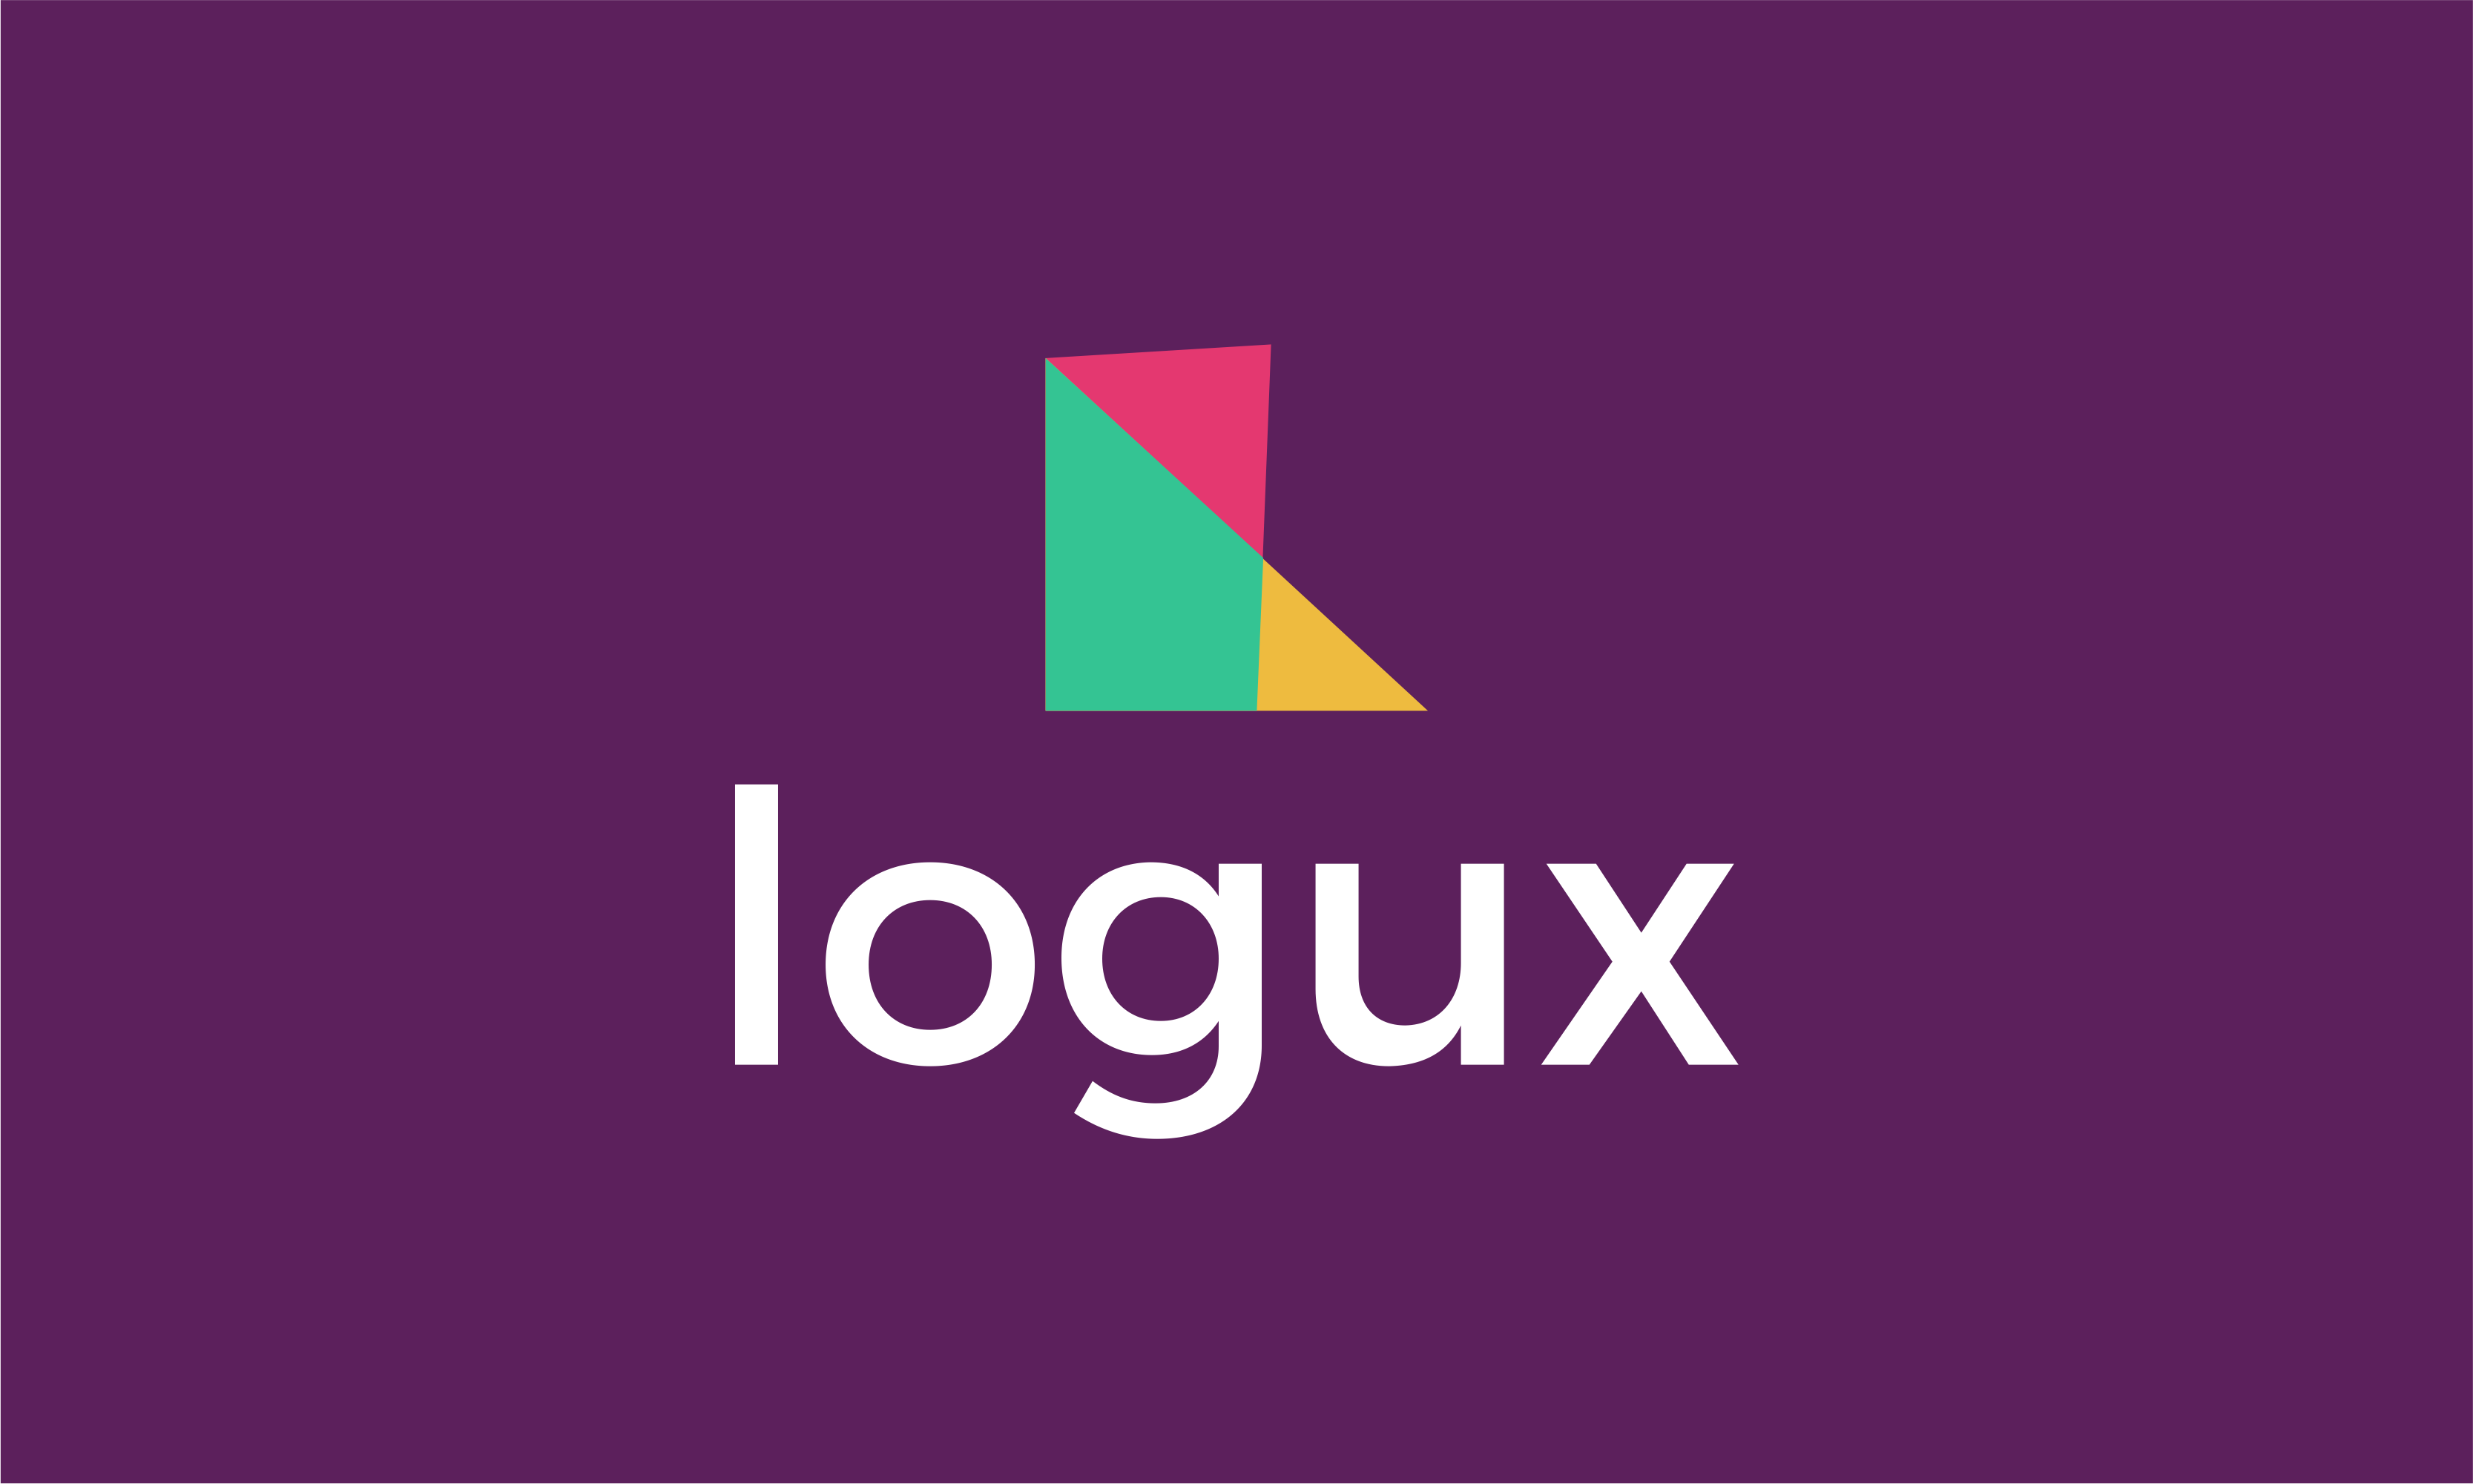 Logux